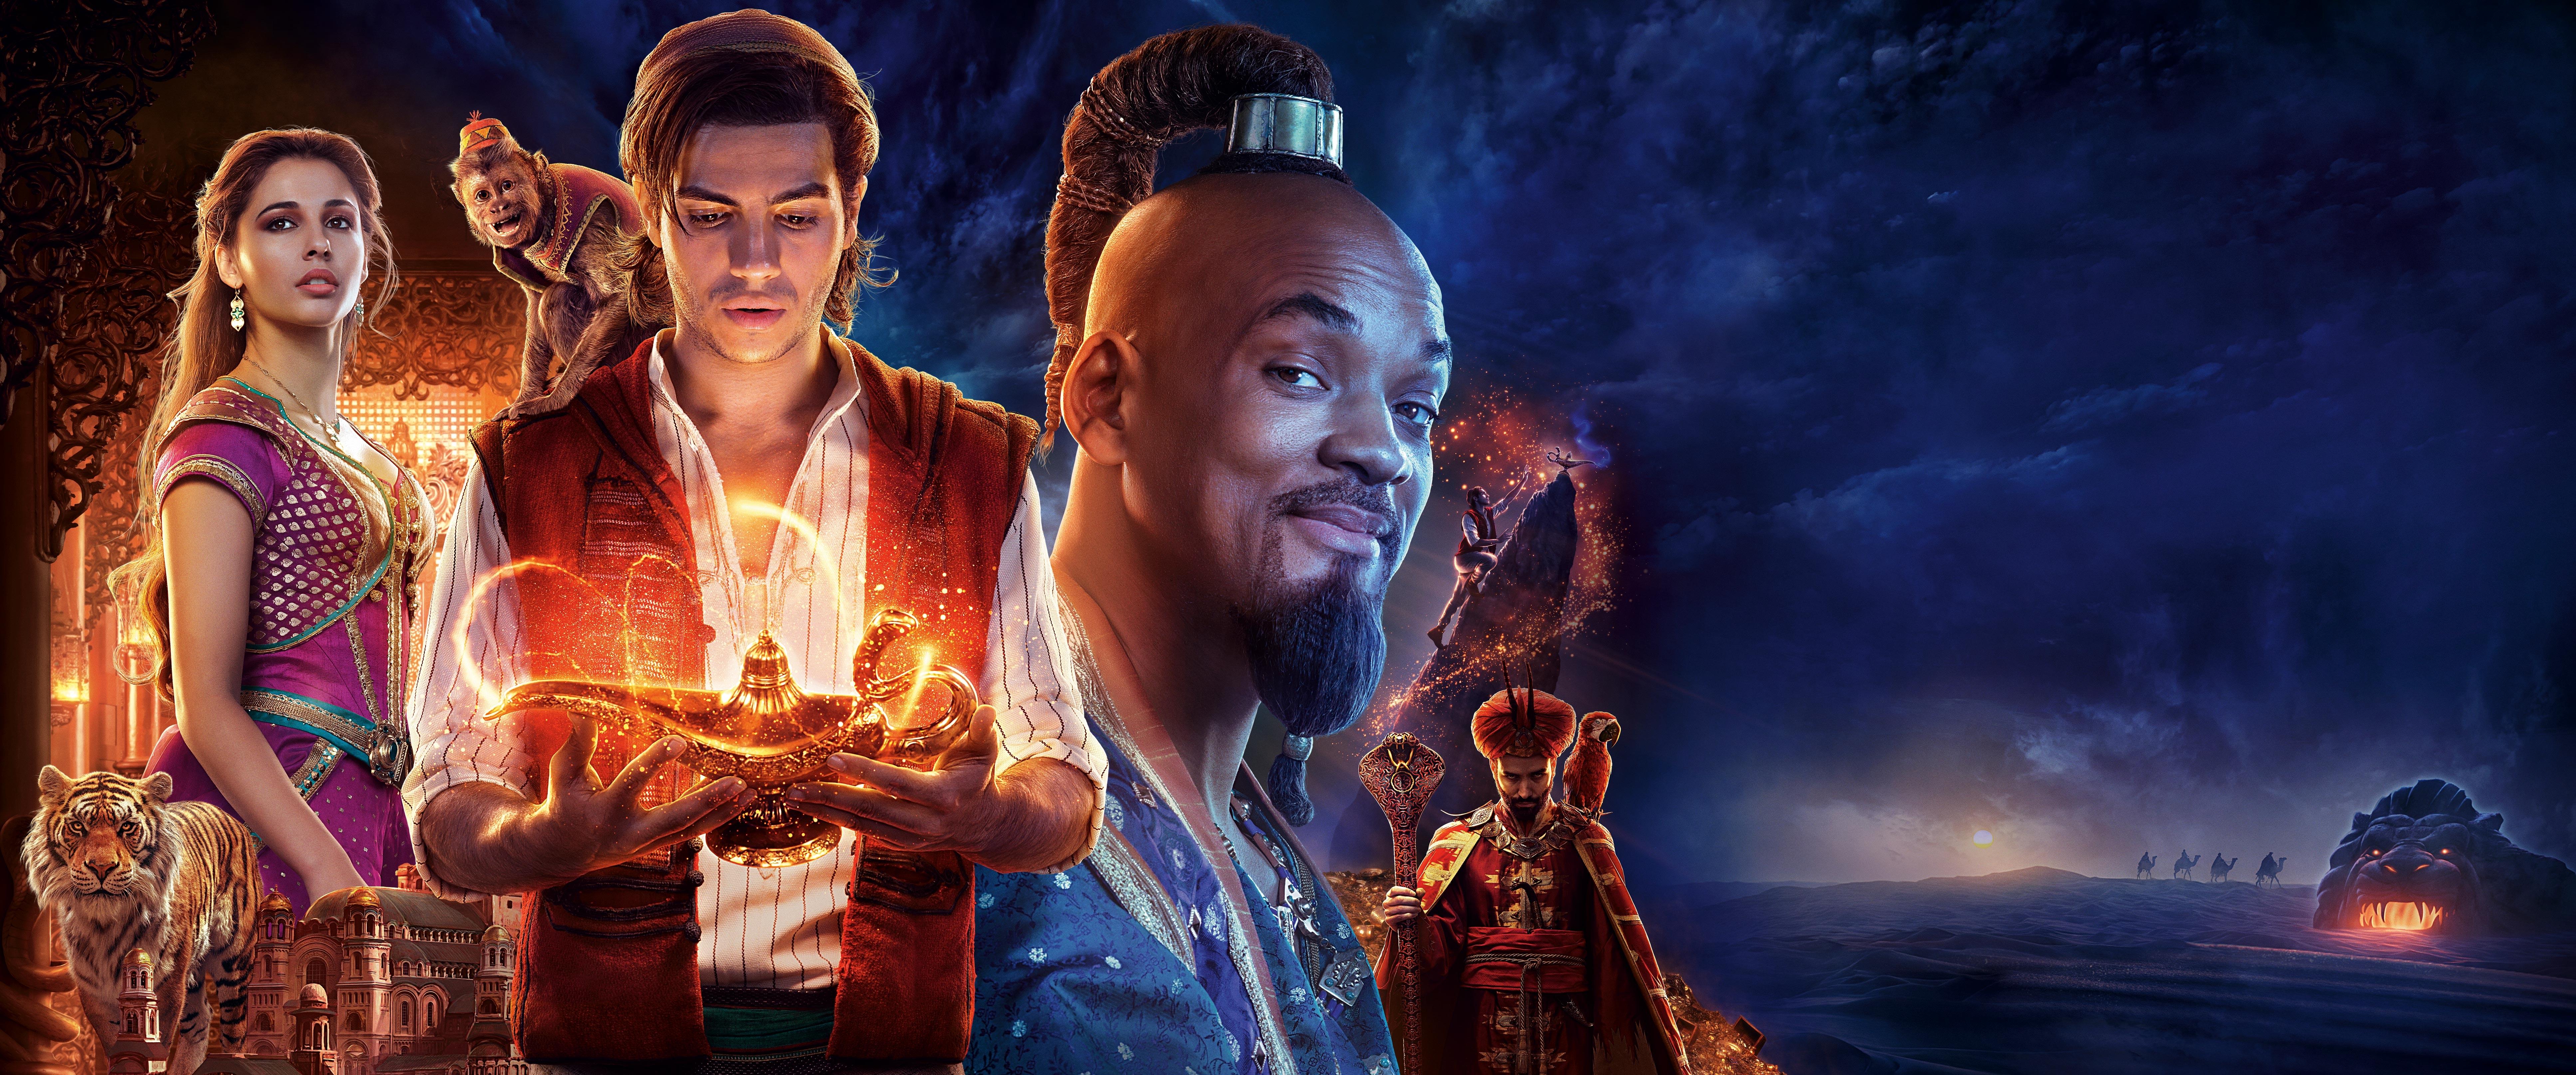 Aladdin Movie 2019 Wallpaper Hd Movies 4k Wallpapers